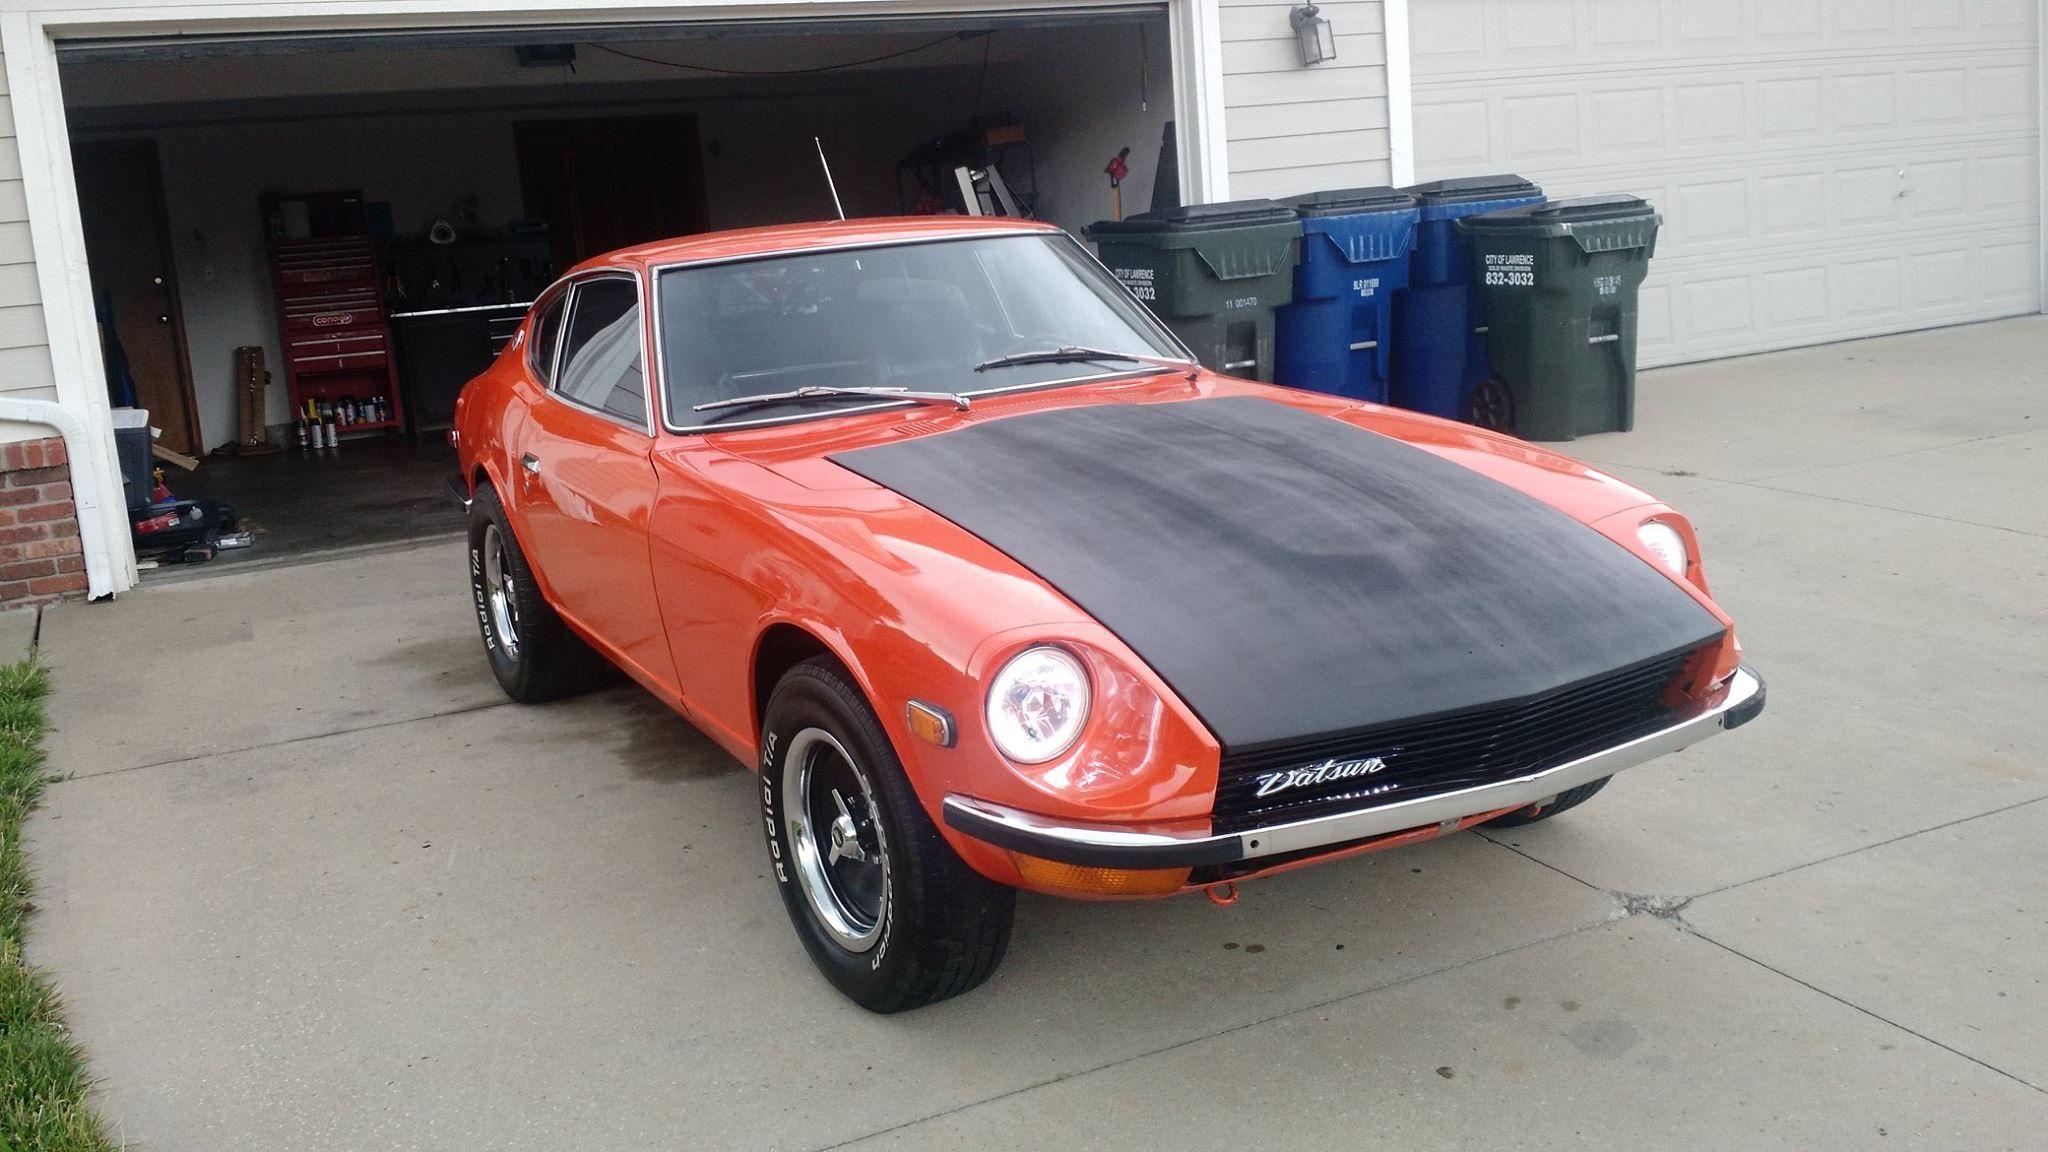 Old-school Datsun 240 Z orange and black | Motor Vehicles cars ...